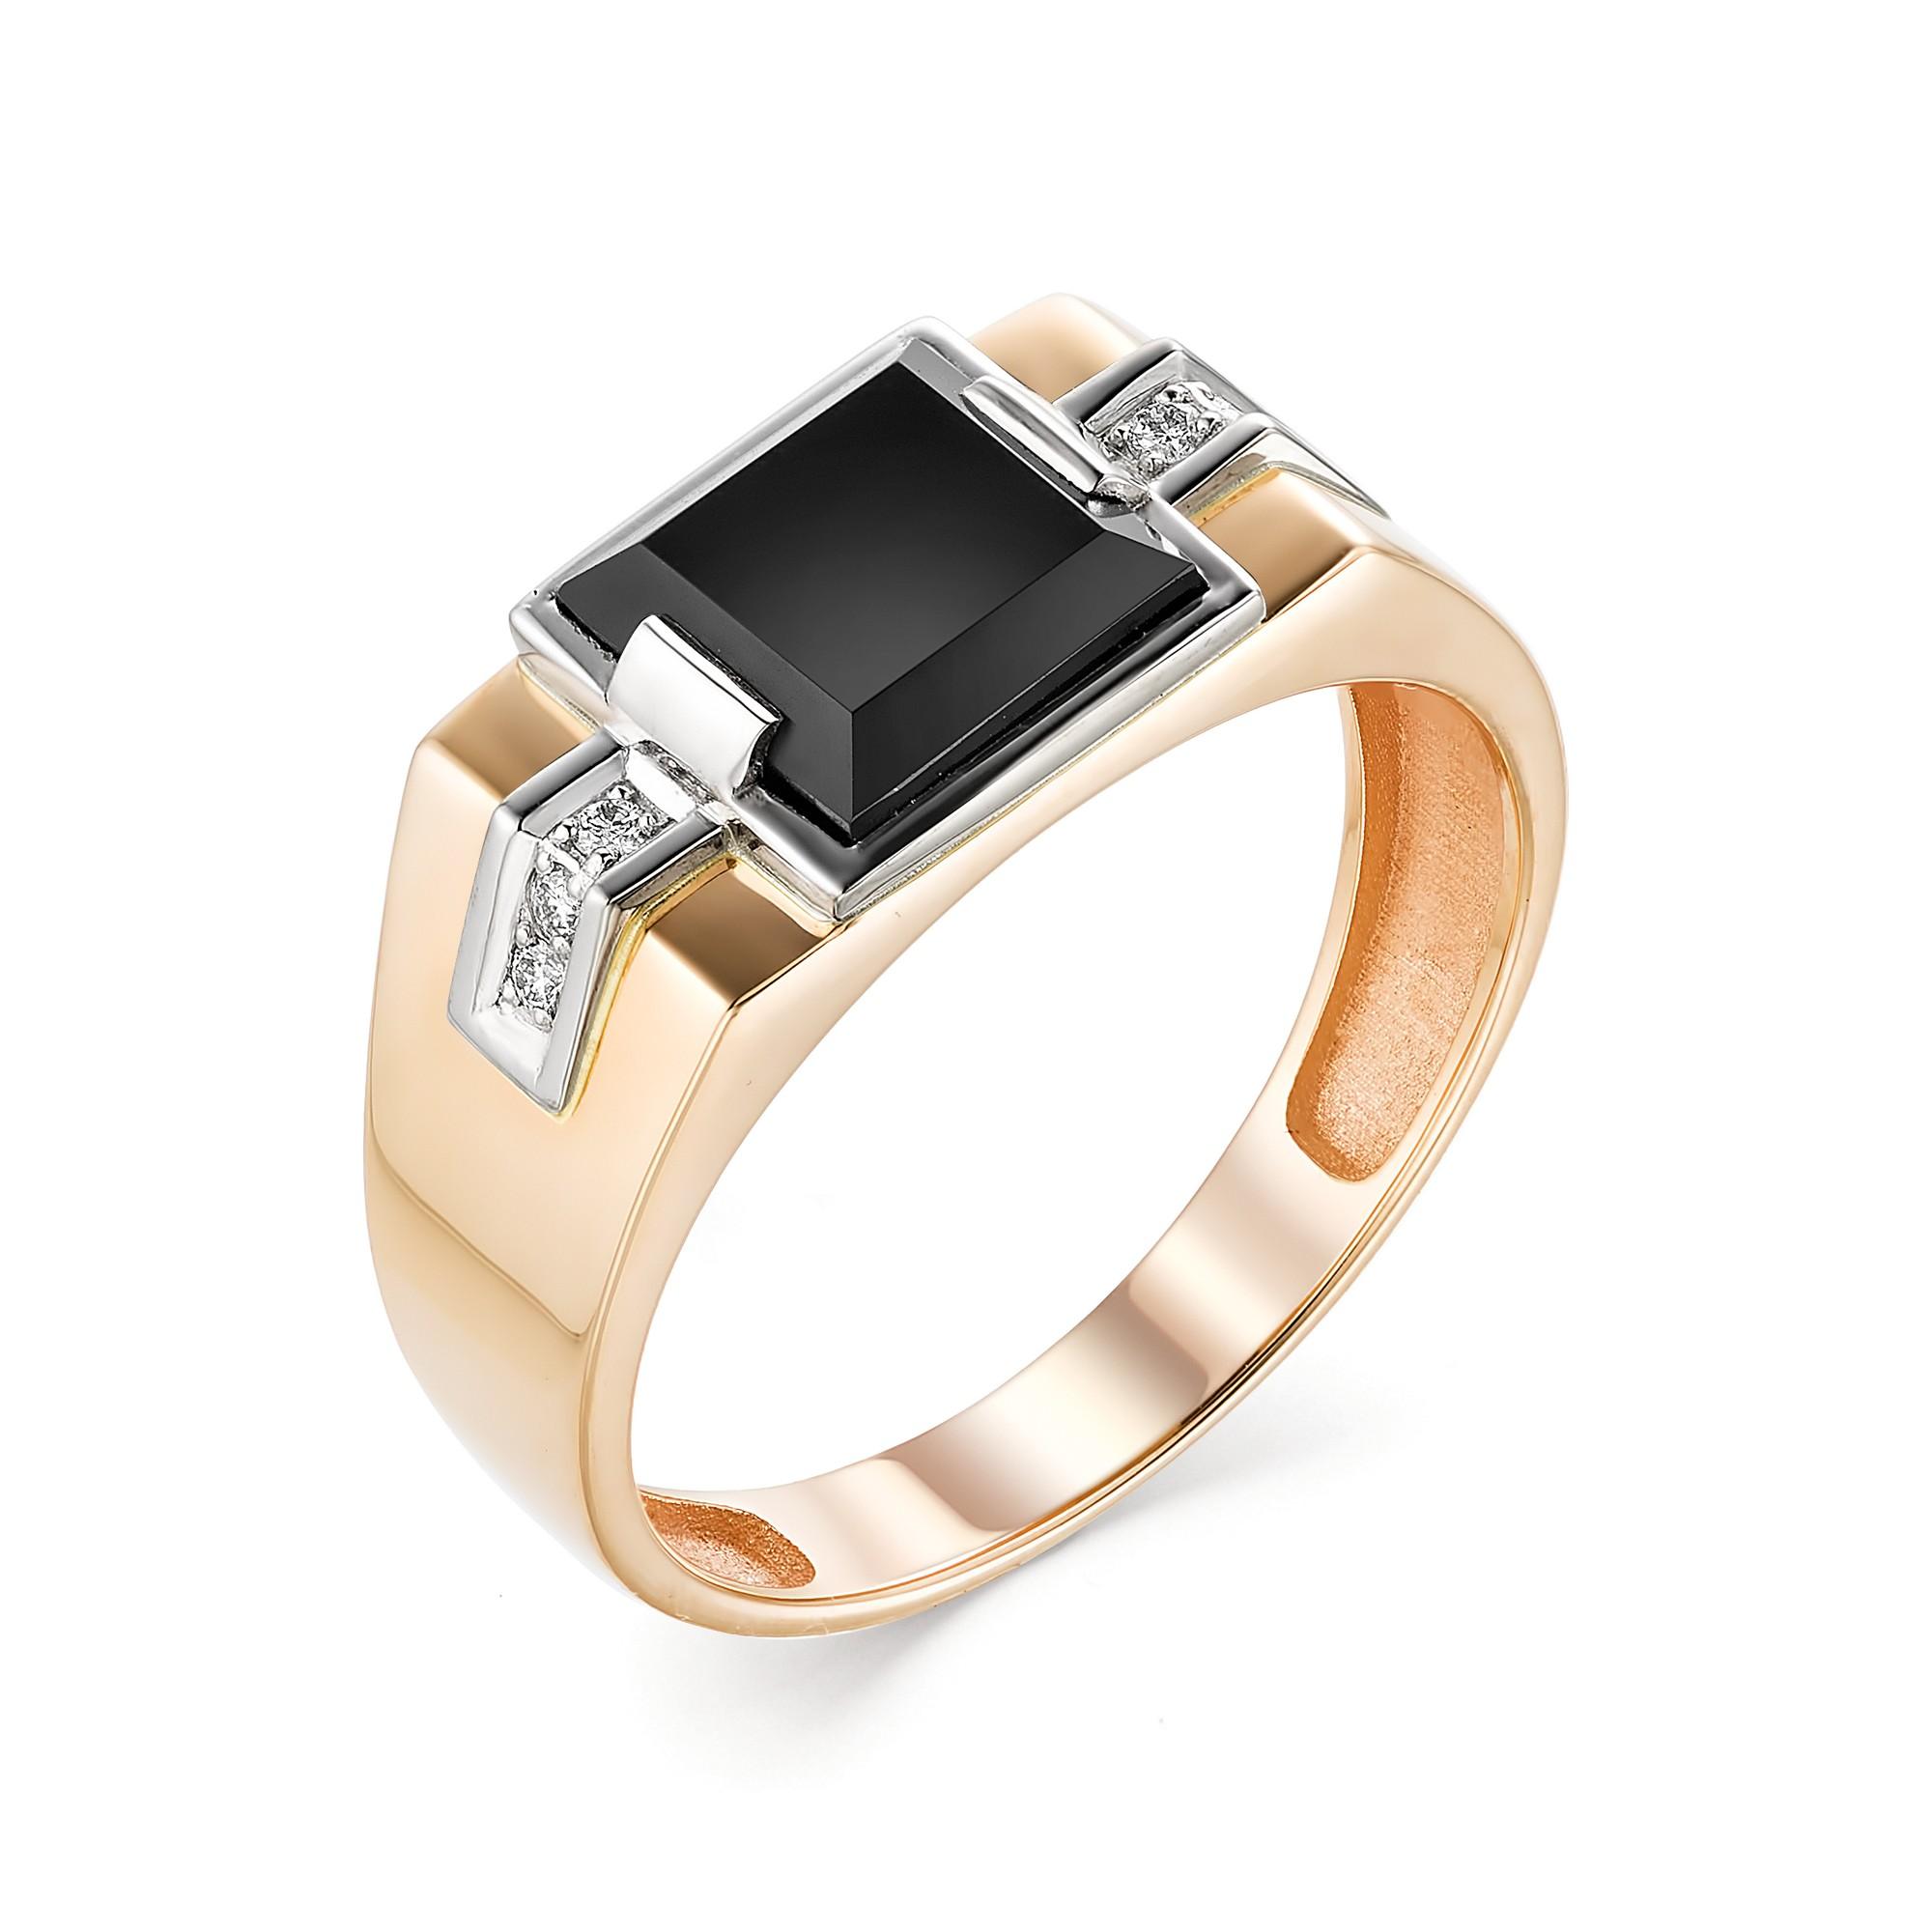 картинка кольцо 13207-111 1 оникс квадрат 1,600 8х8 , 6 бриллиант круг 57 0,060 90-120 4/5а 13207-111